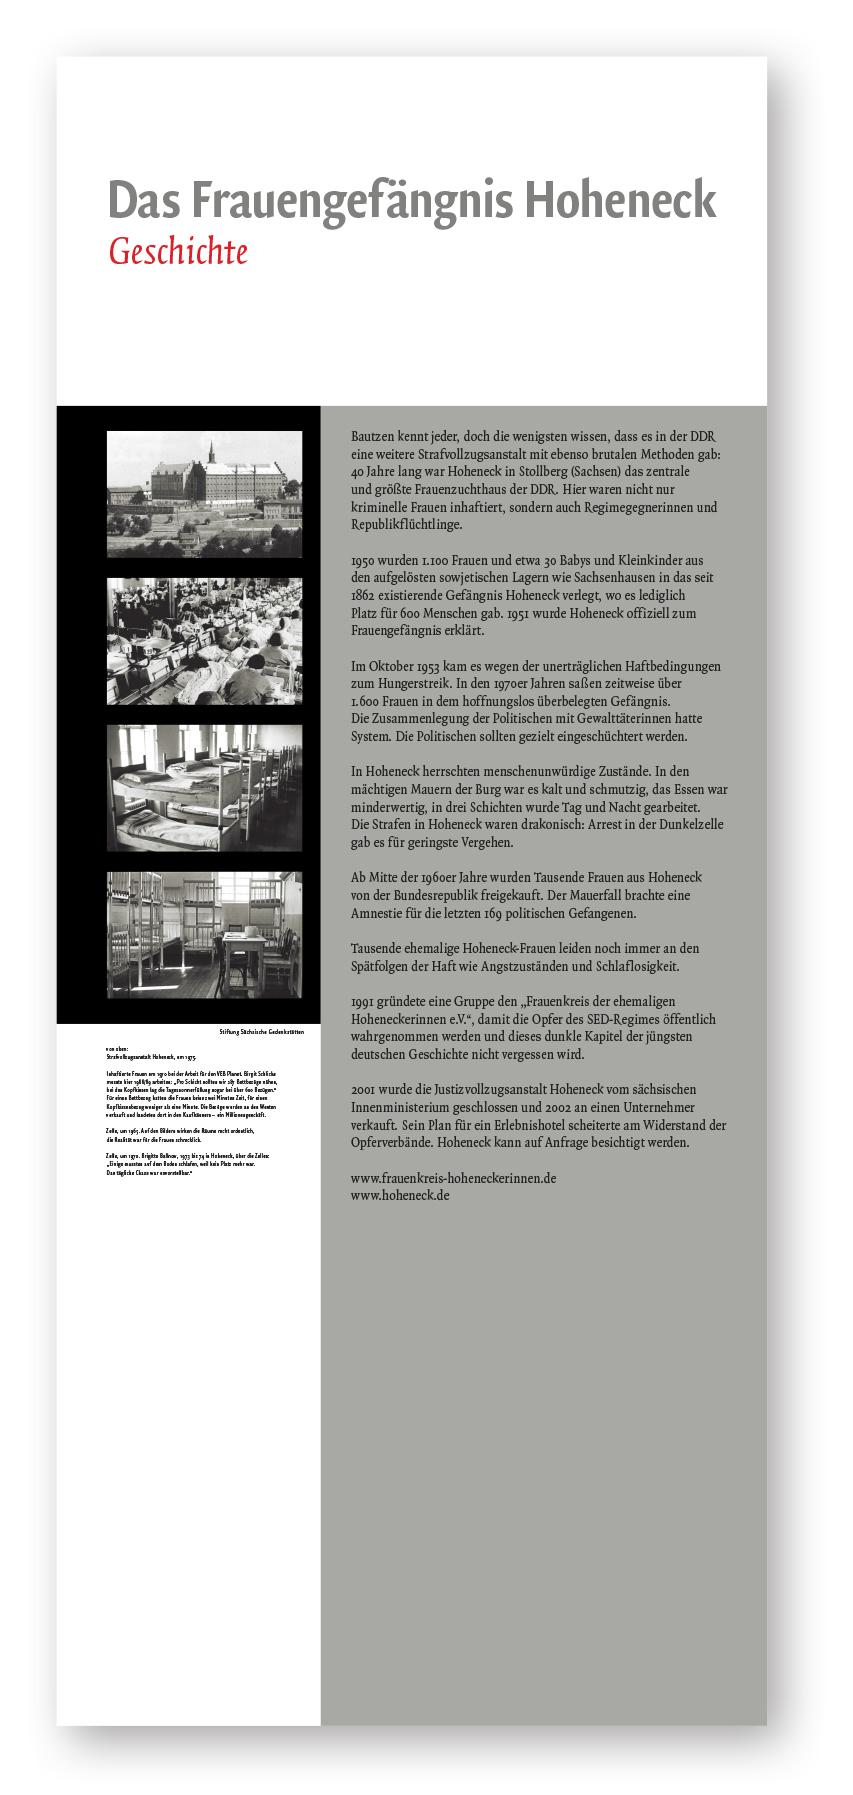 veranstaltung-hoheneck-banner2-coyright-typoly